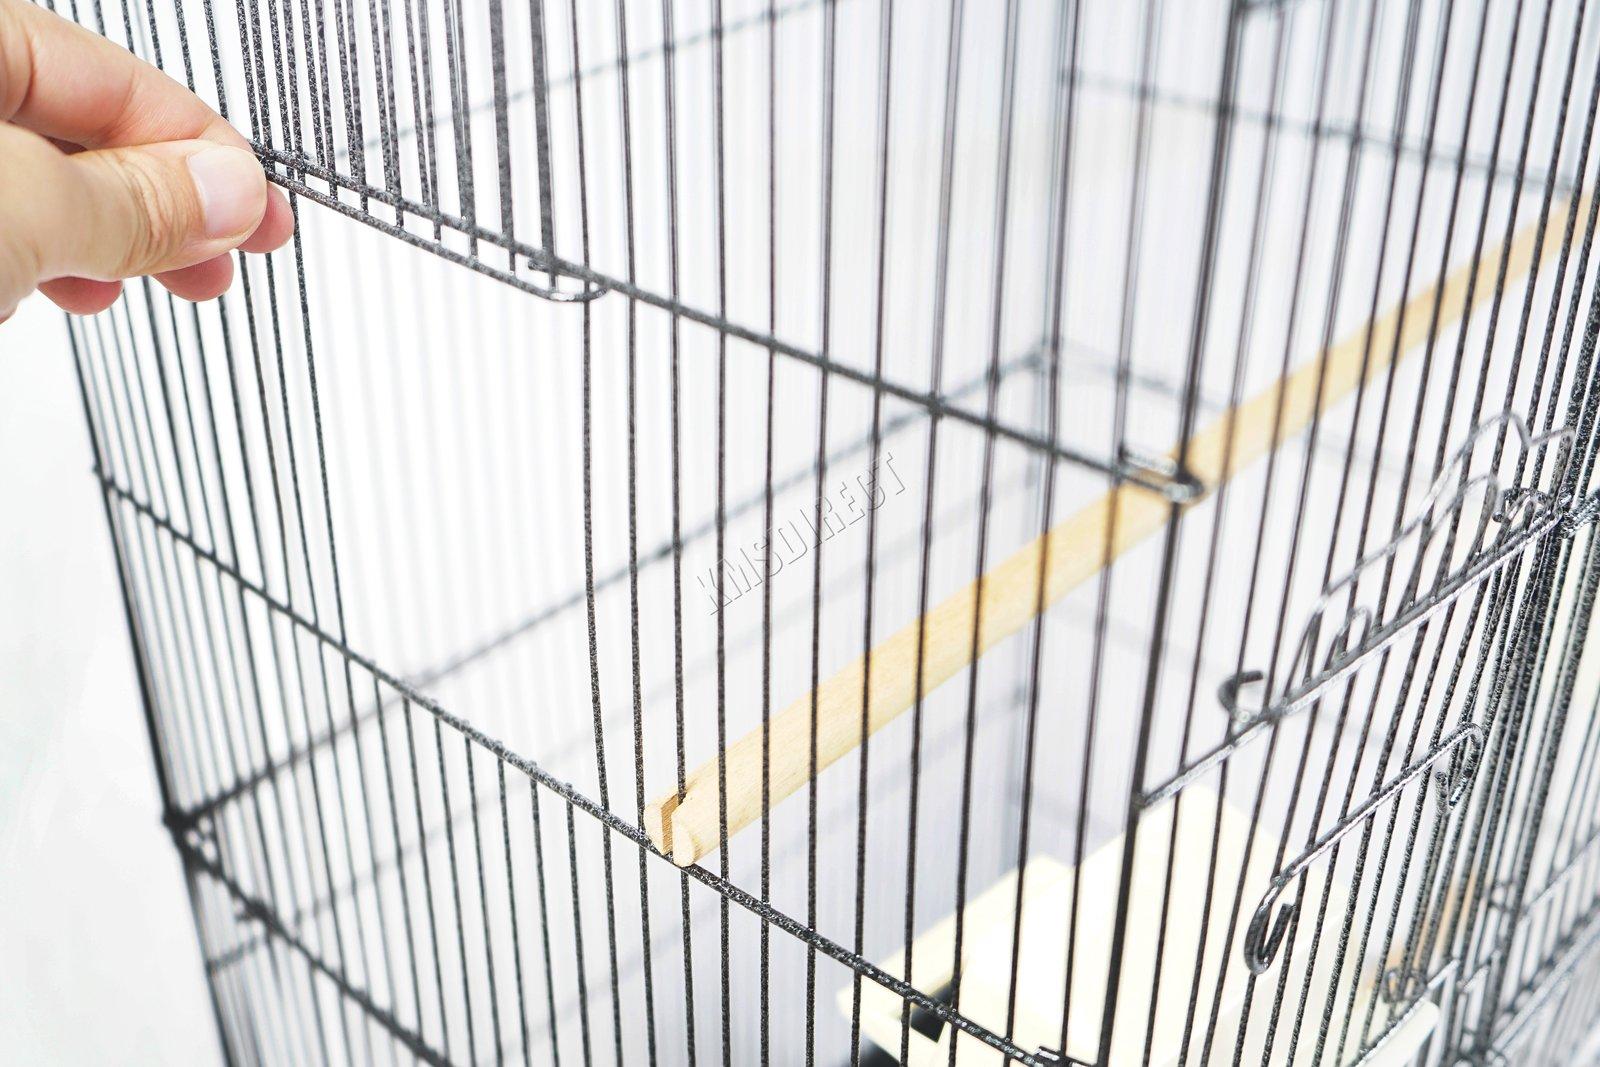 BIRD CAGE METAL MBC 05 HAMMERED SILVER KMSWM12 - Foxhunter Grande Metal Jaula con Soporte Pajarera Loro Periquito Canario Cacatua